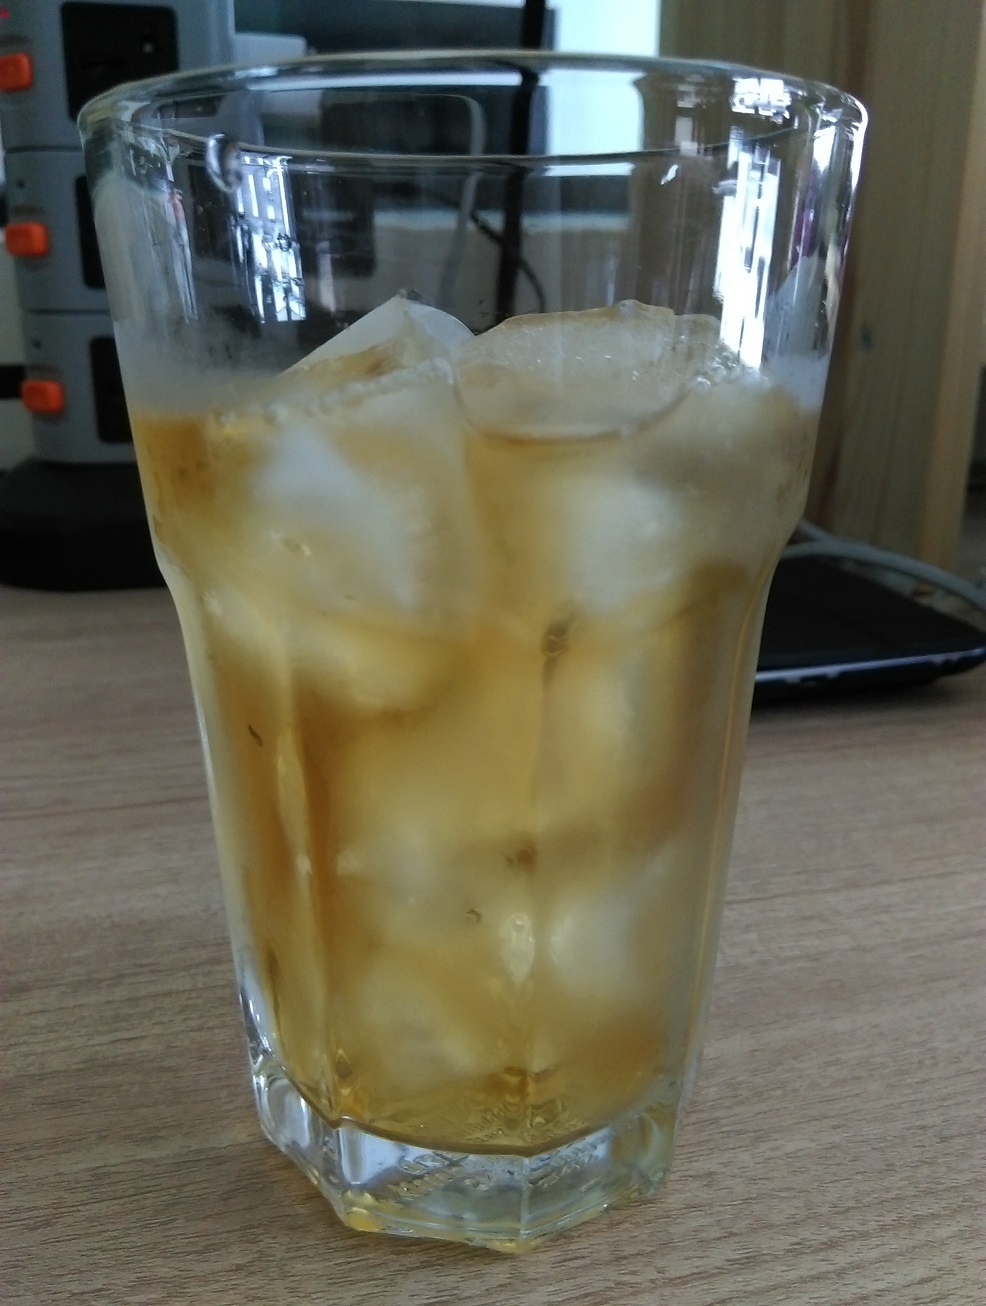 Green tea with ice.